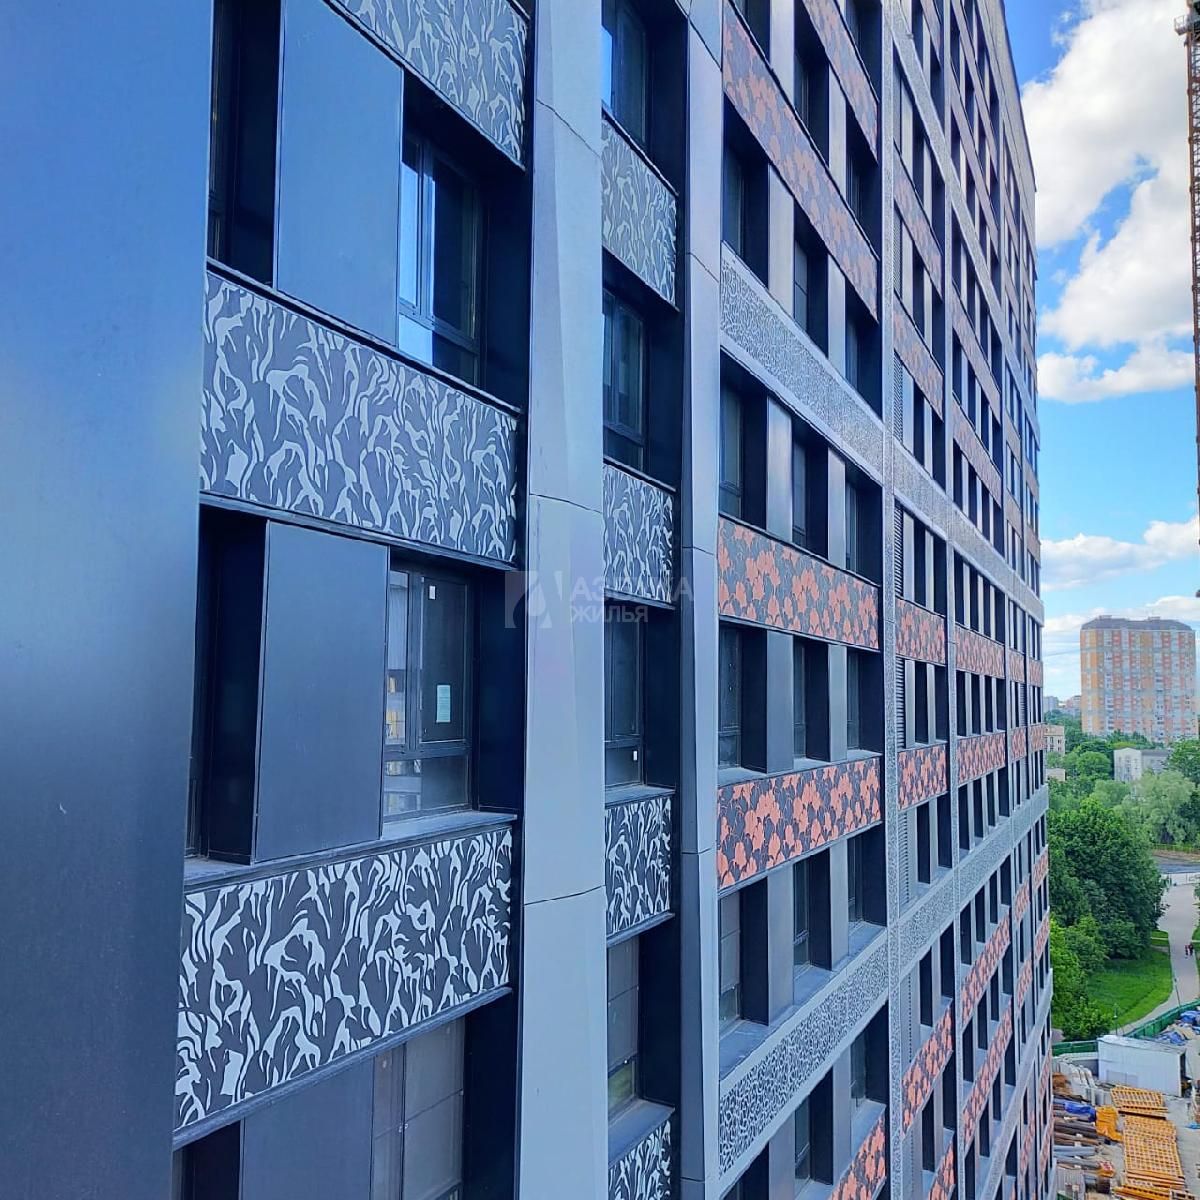 Фото №20 - 3-комнатная квартира, Москва, Серебрякова проезд 11 корпус 1, метро Ботанический сад